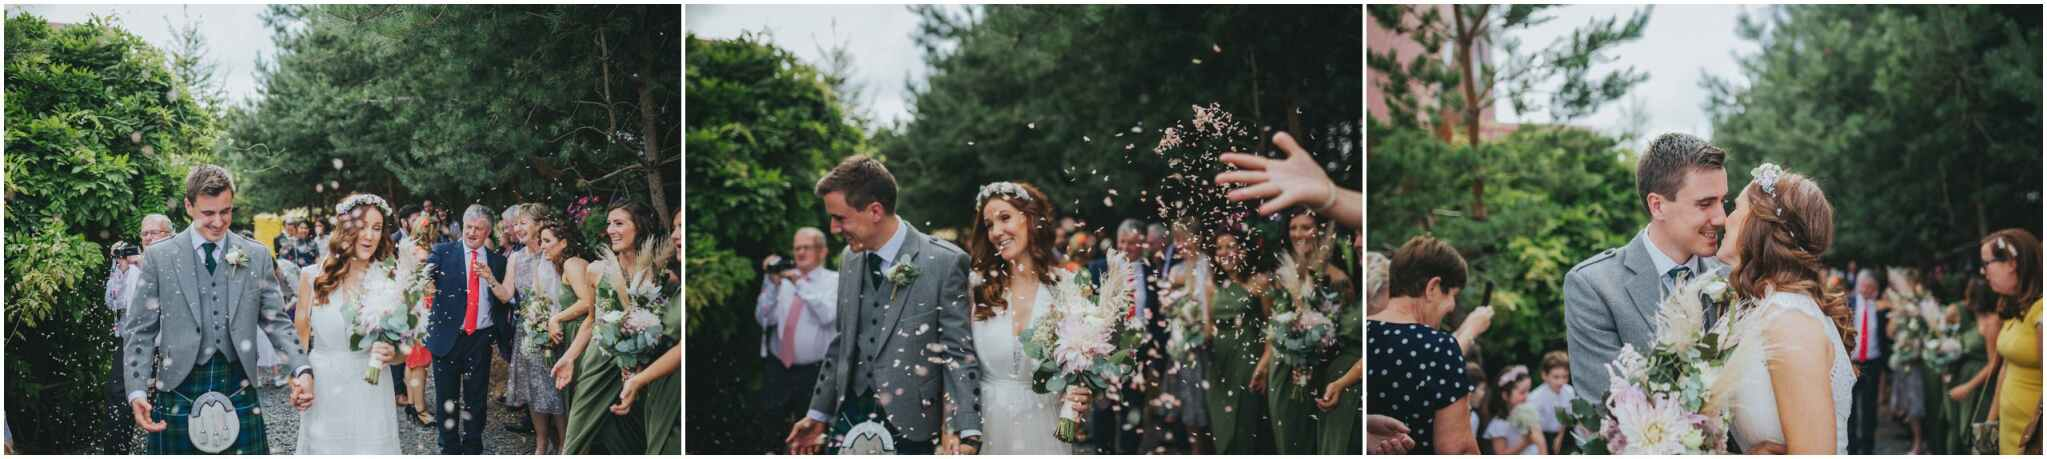 Fionnuala + Paul - Mount Druid Alternative Wedding 103